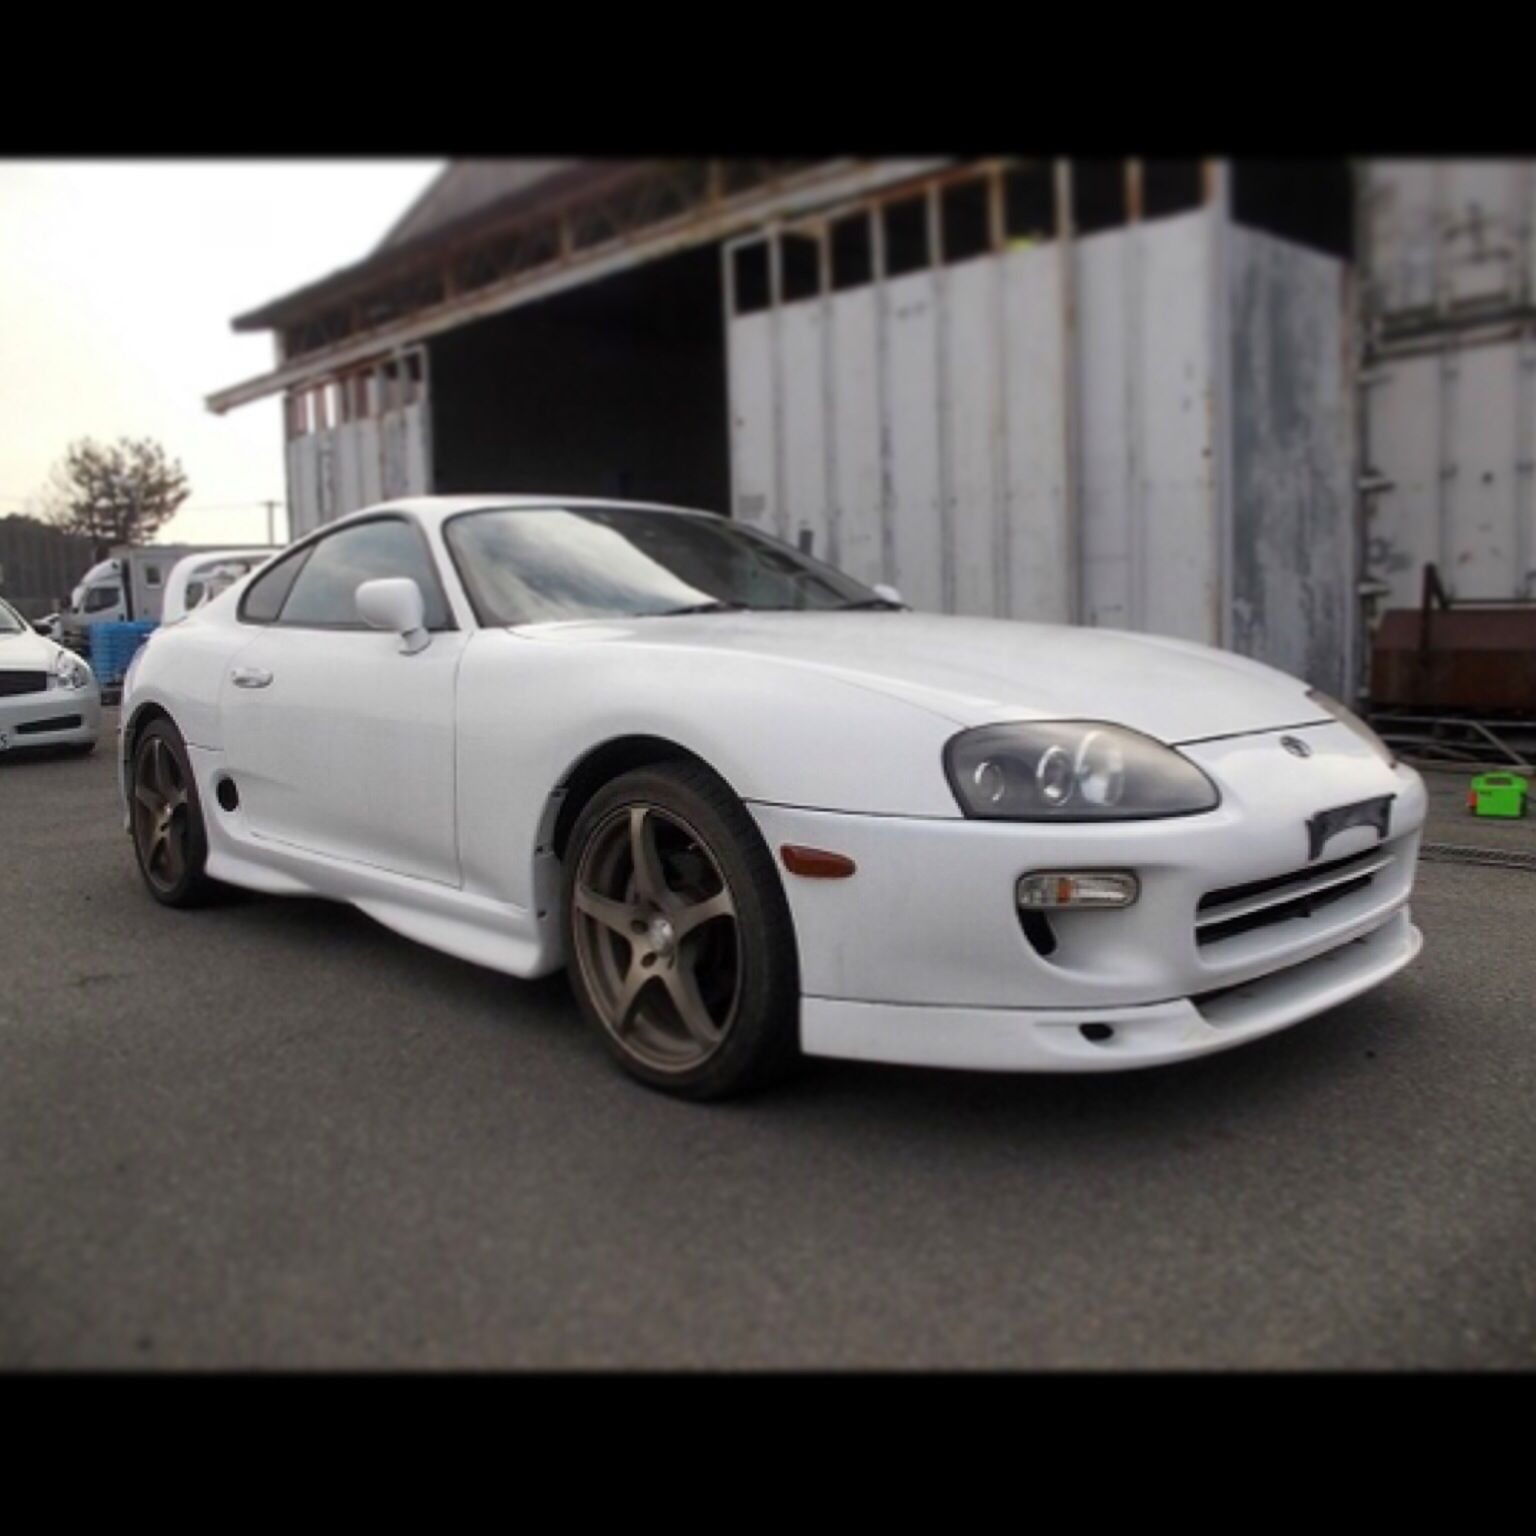 Bon Toyota Supra 1996 #toyota #supra #jdm #manual #white #dream #